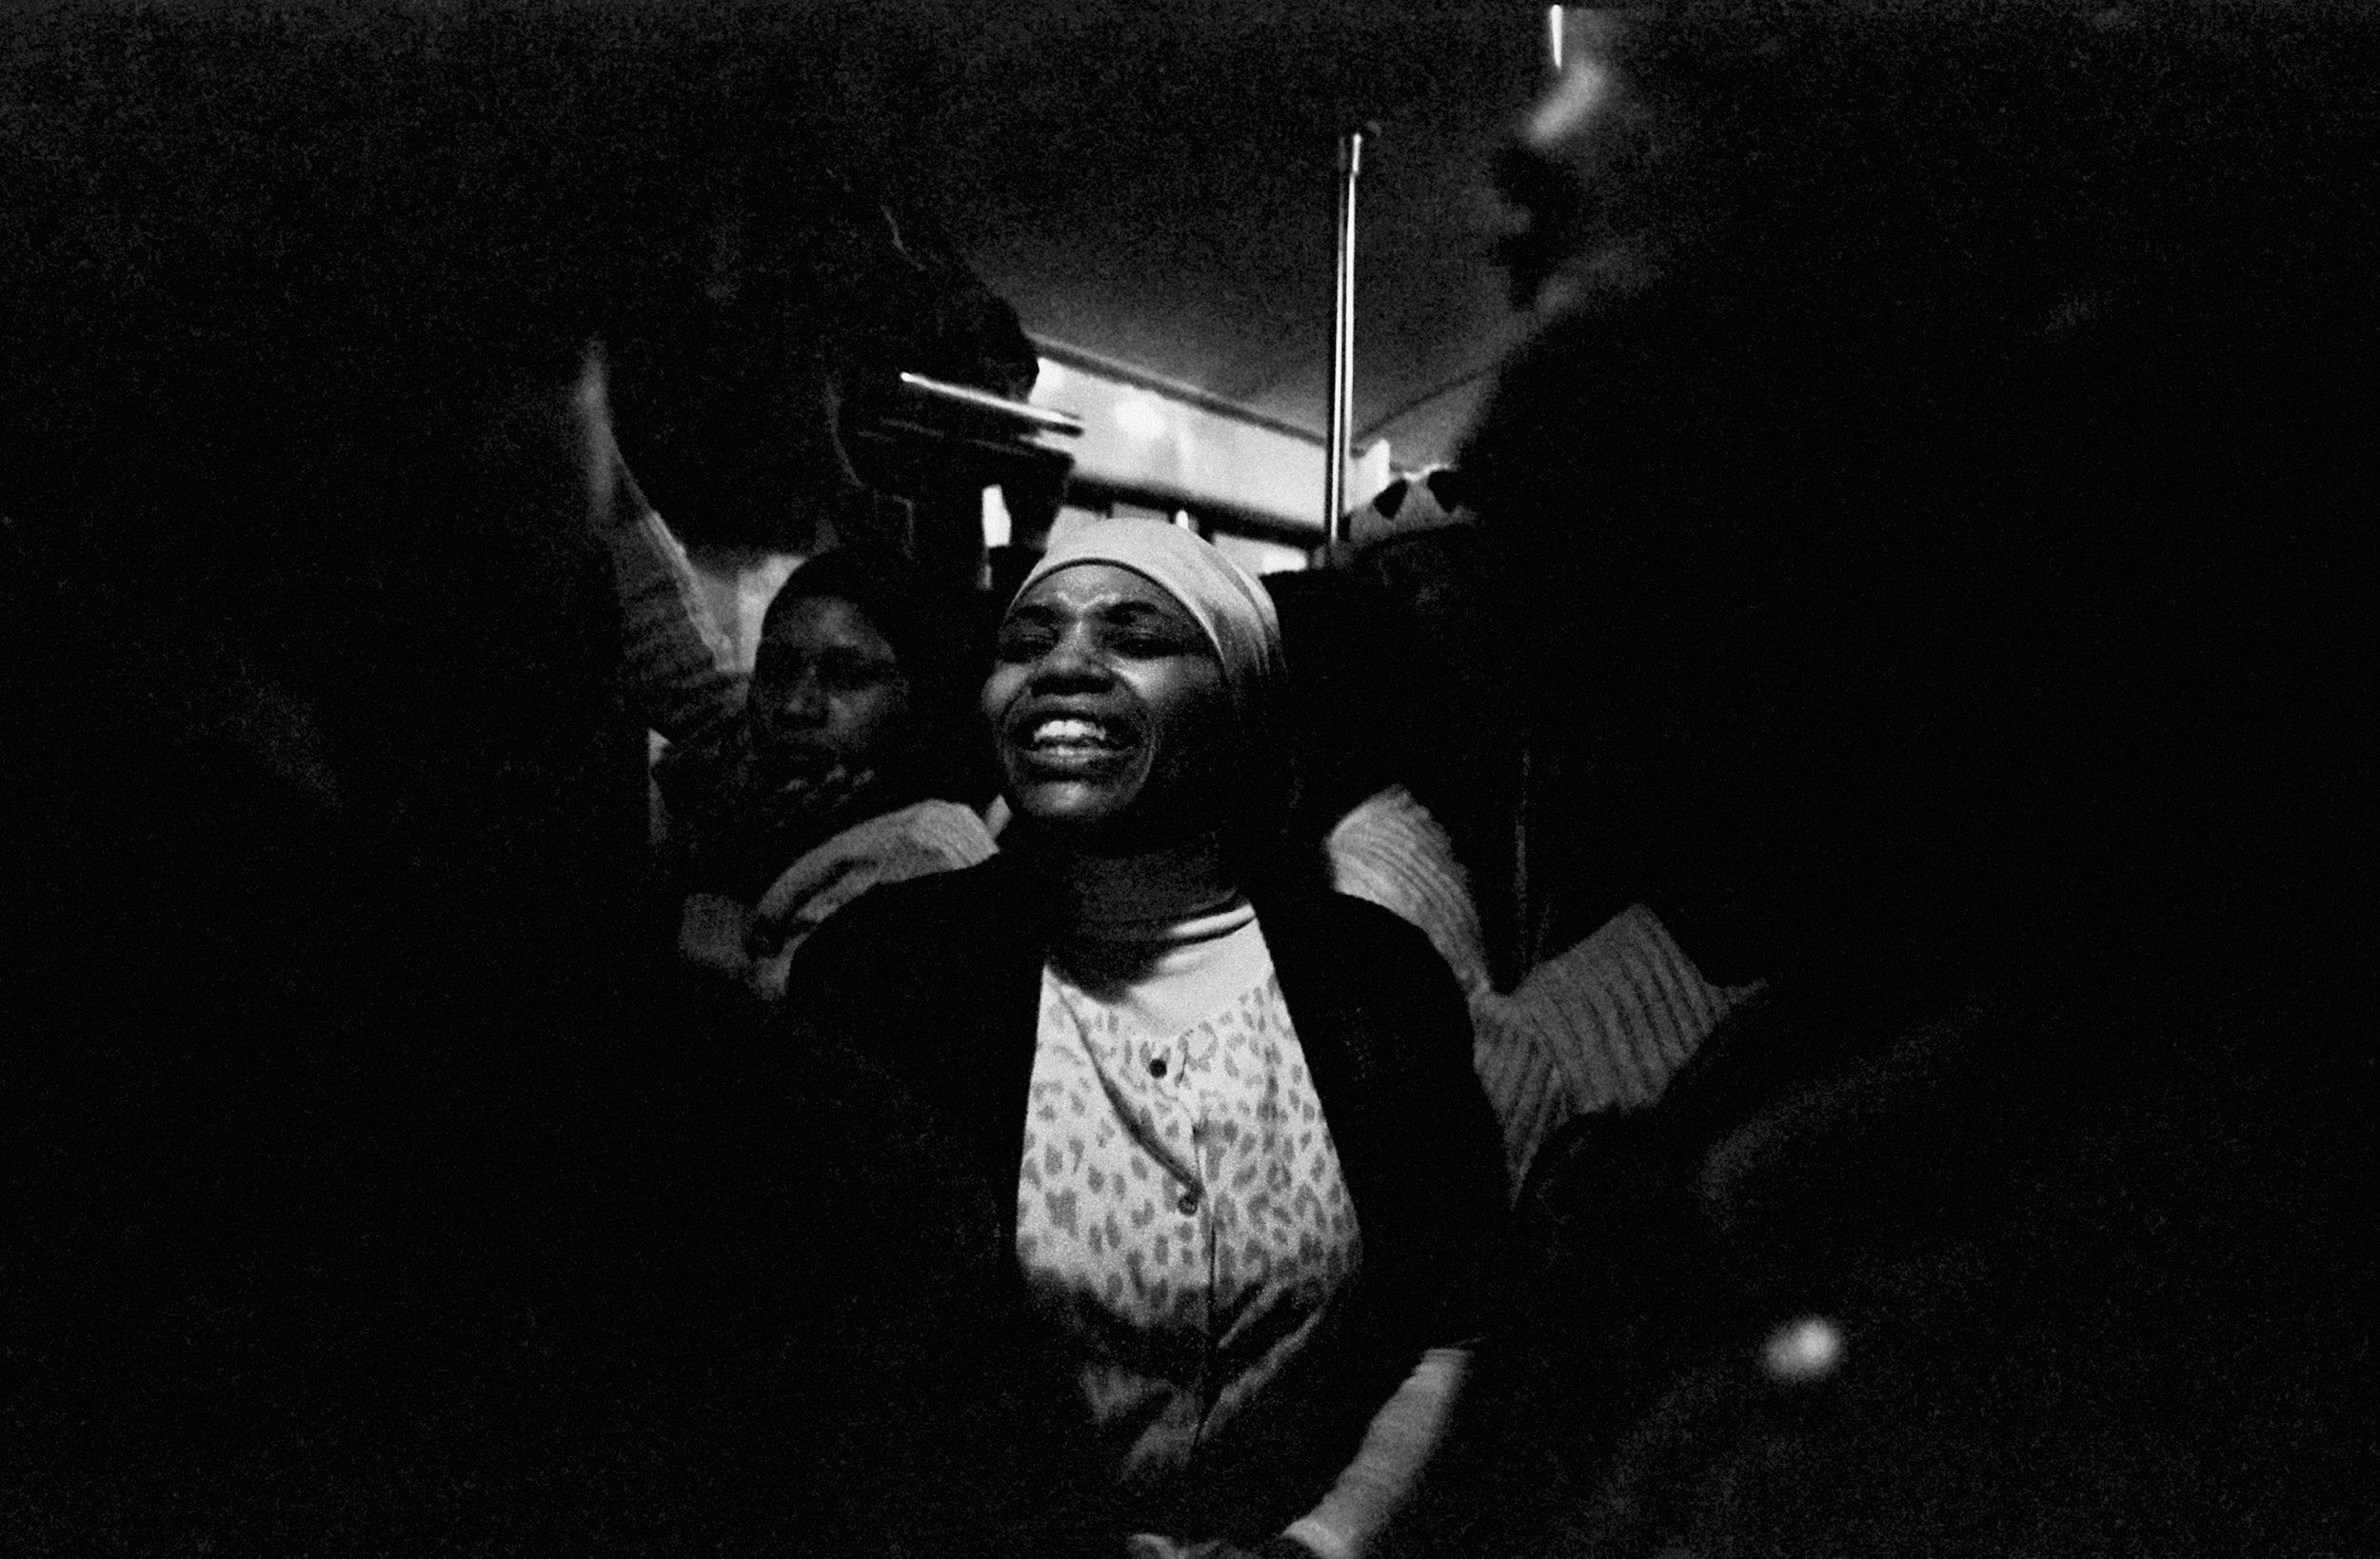 Exhortations, Johannesburg–Soweto Line , 1986. Photograph by Santu Mofokeng, ©Santu Mofokeng Foundation. Images courtesy Lunetta Bartz, MAKER, Johannesburg.